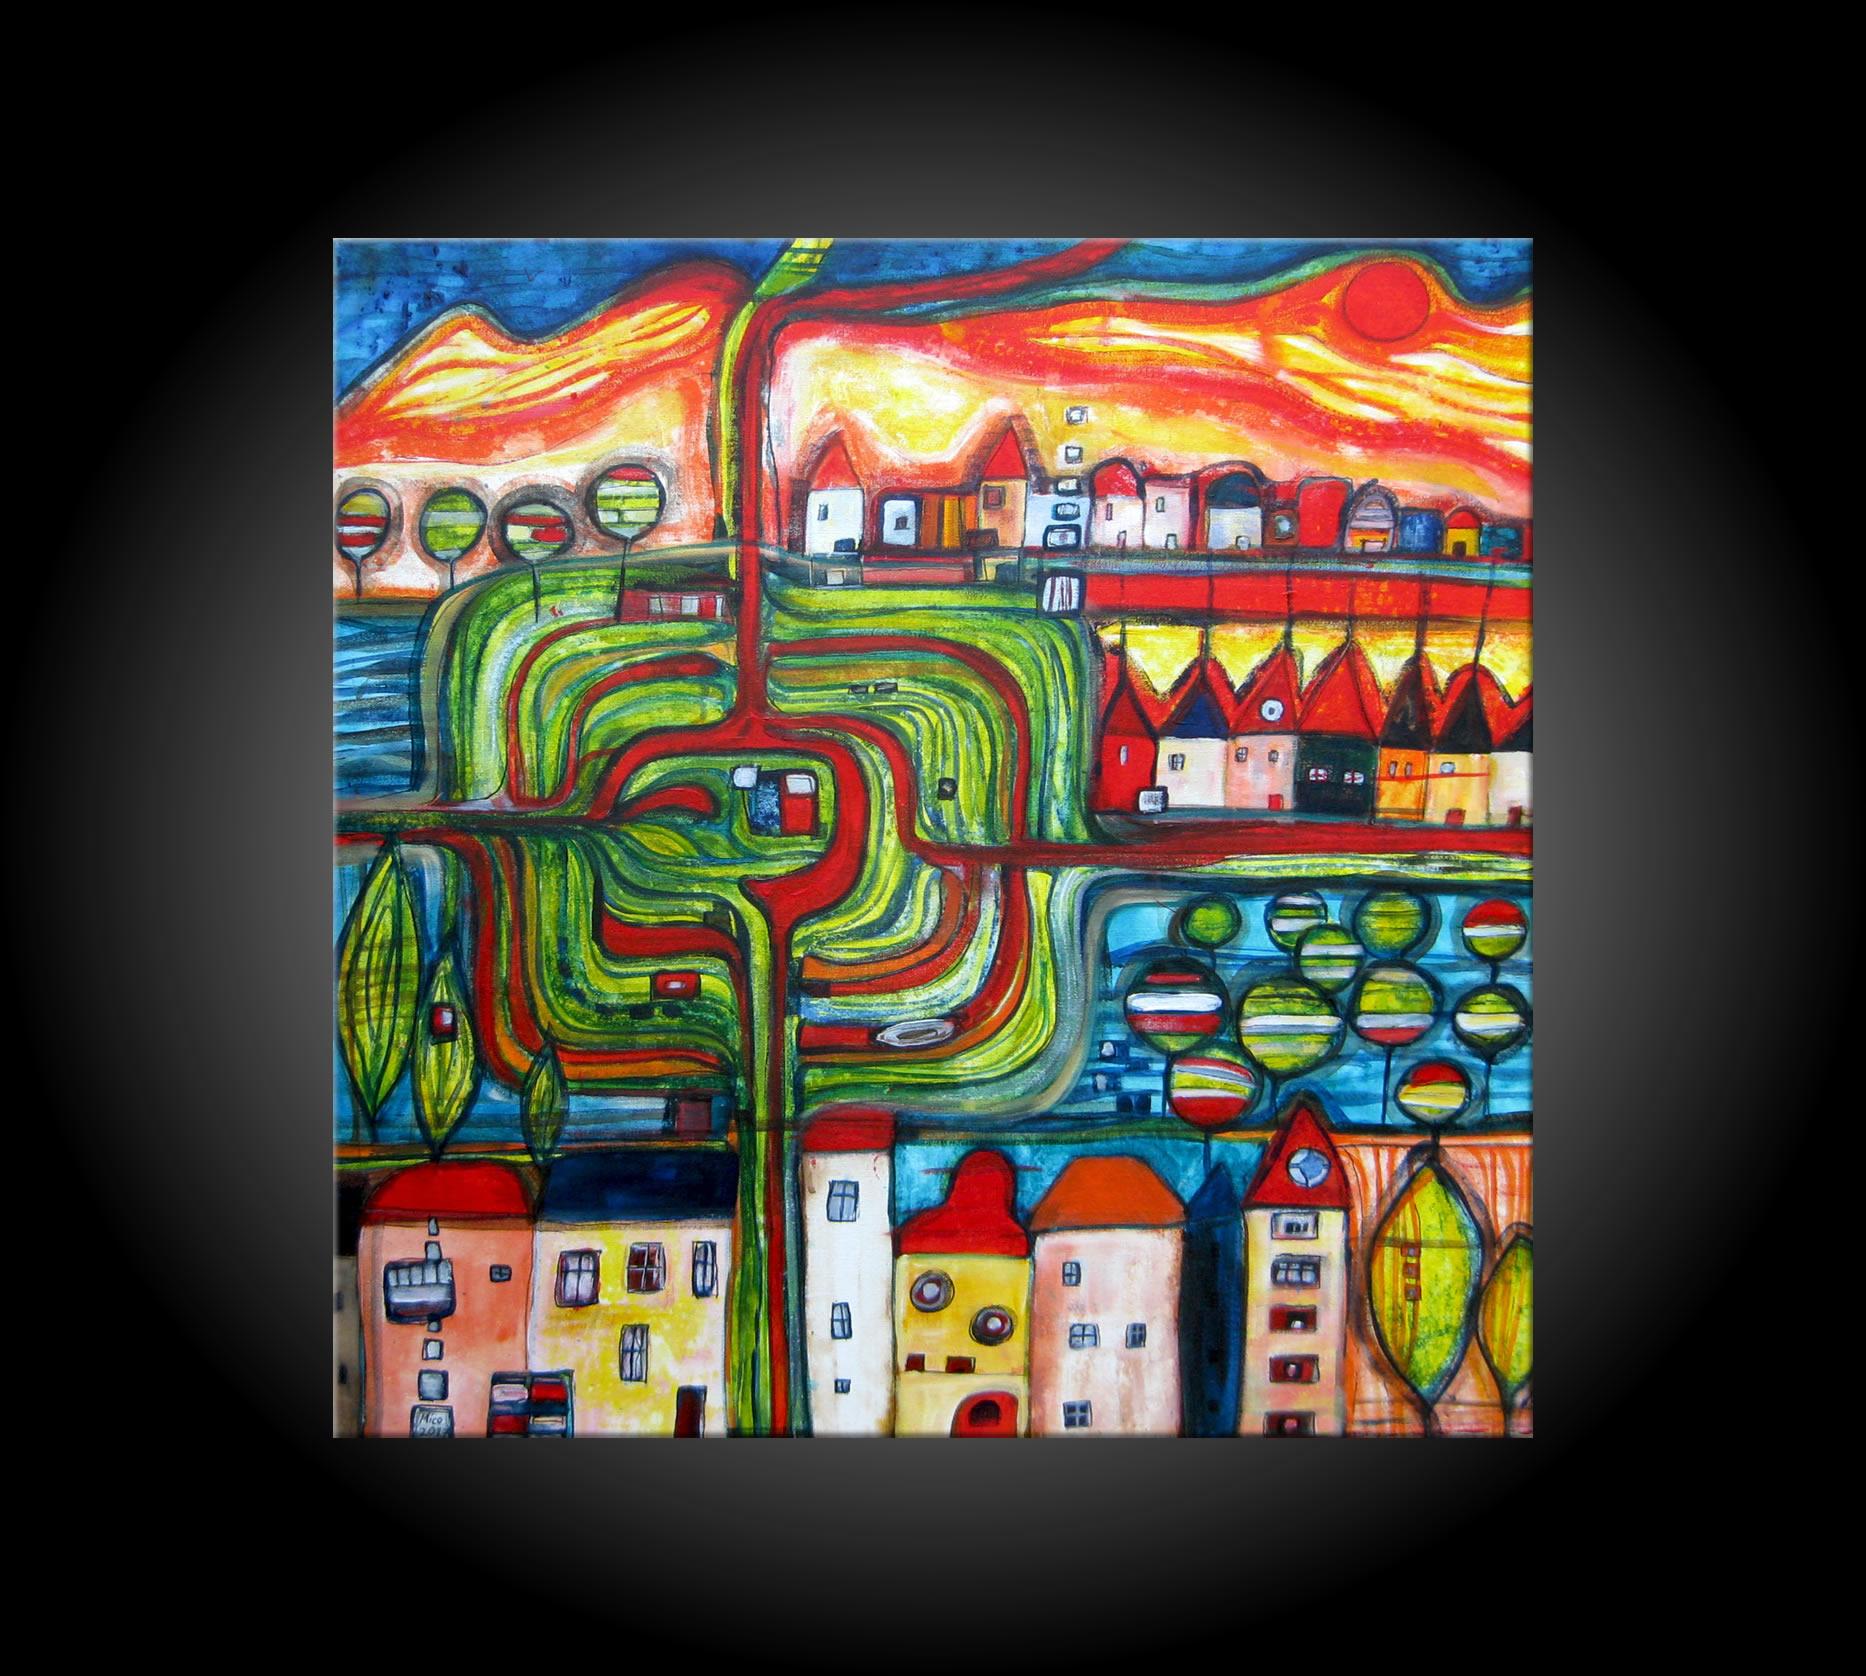 MICO Original Acrylbild HANDGEMALT Gemälde KUNST Bilder abstrakt ...